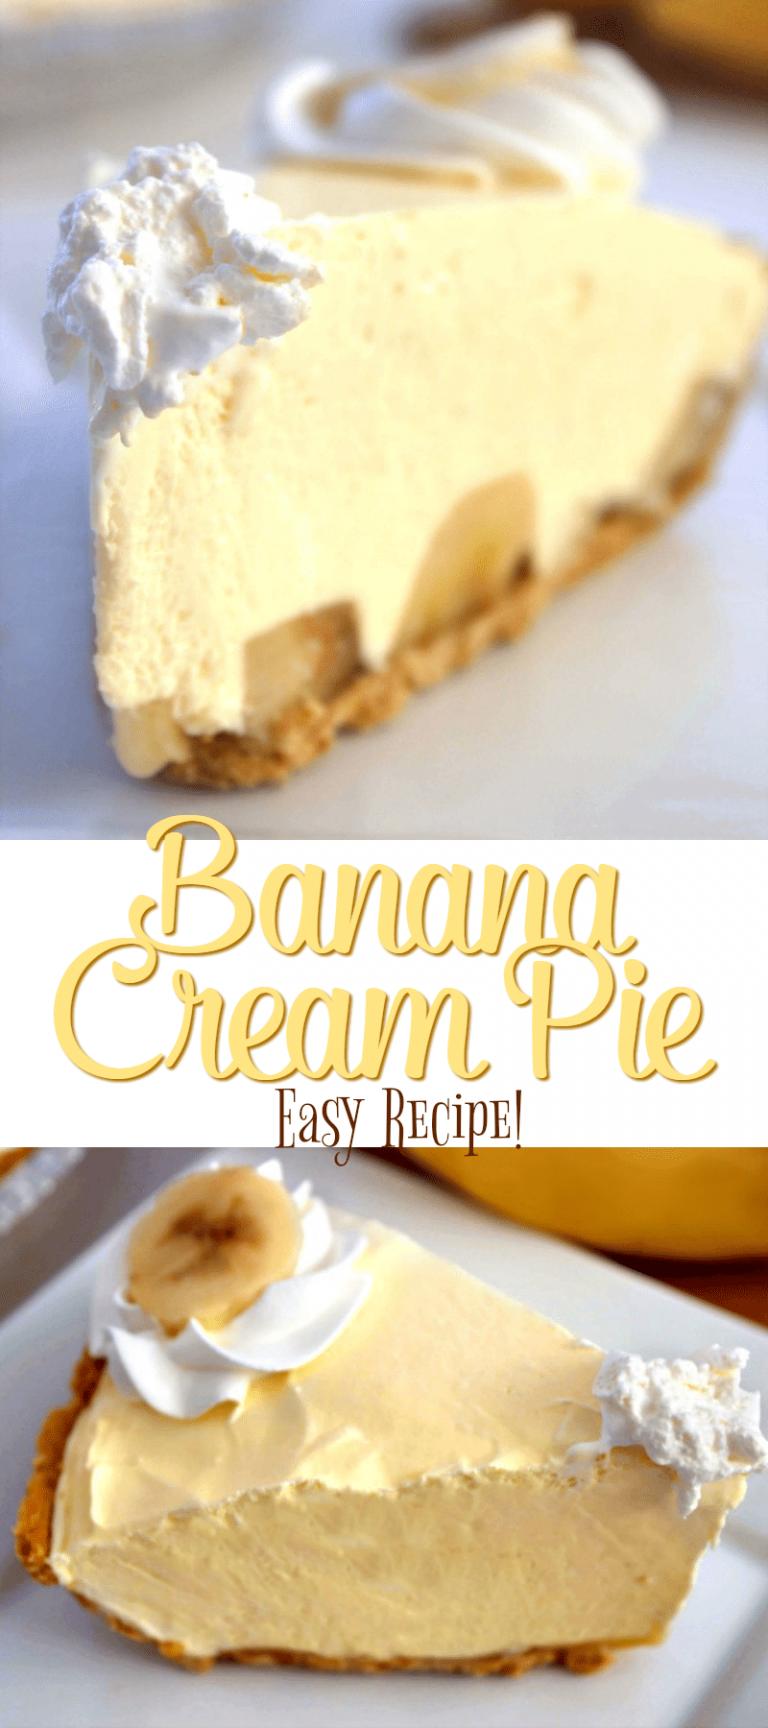 Easy Banana Cream Pie Recipe - The best and easiest Banana Cream Pie ever! #bananapie